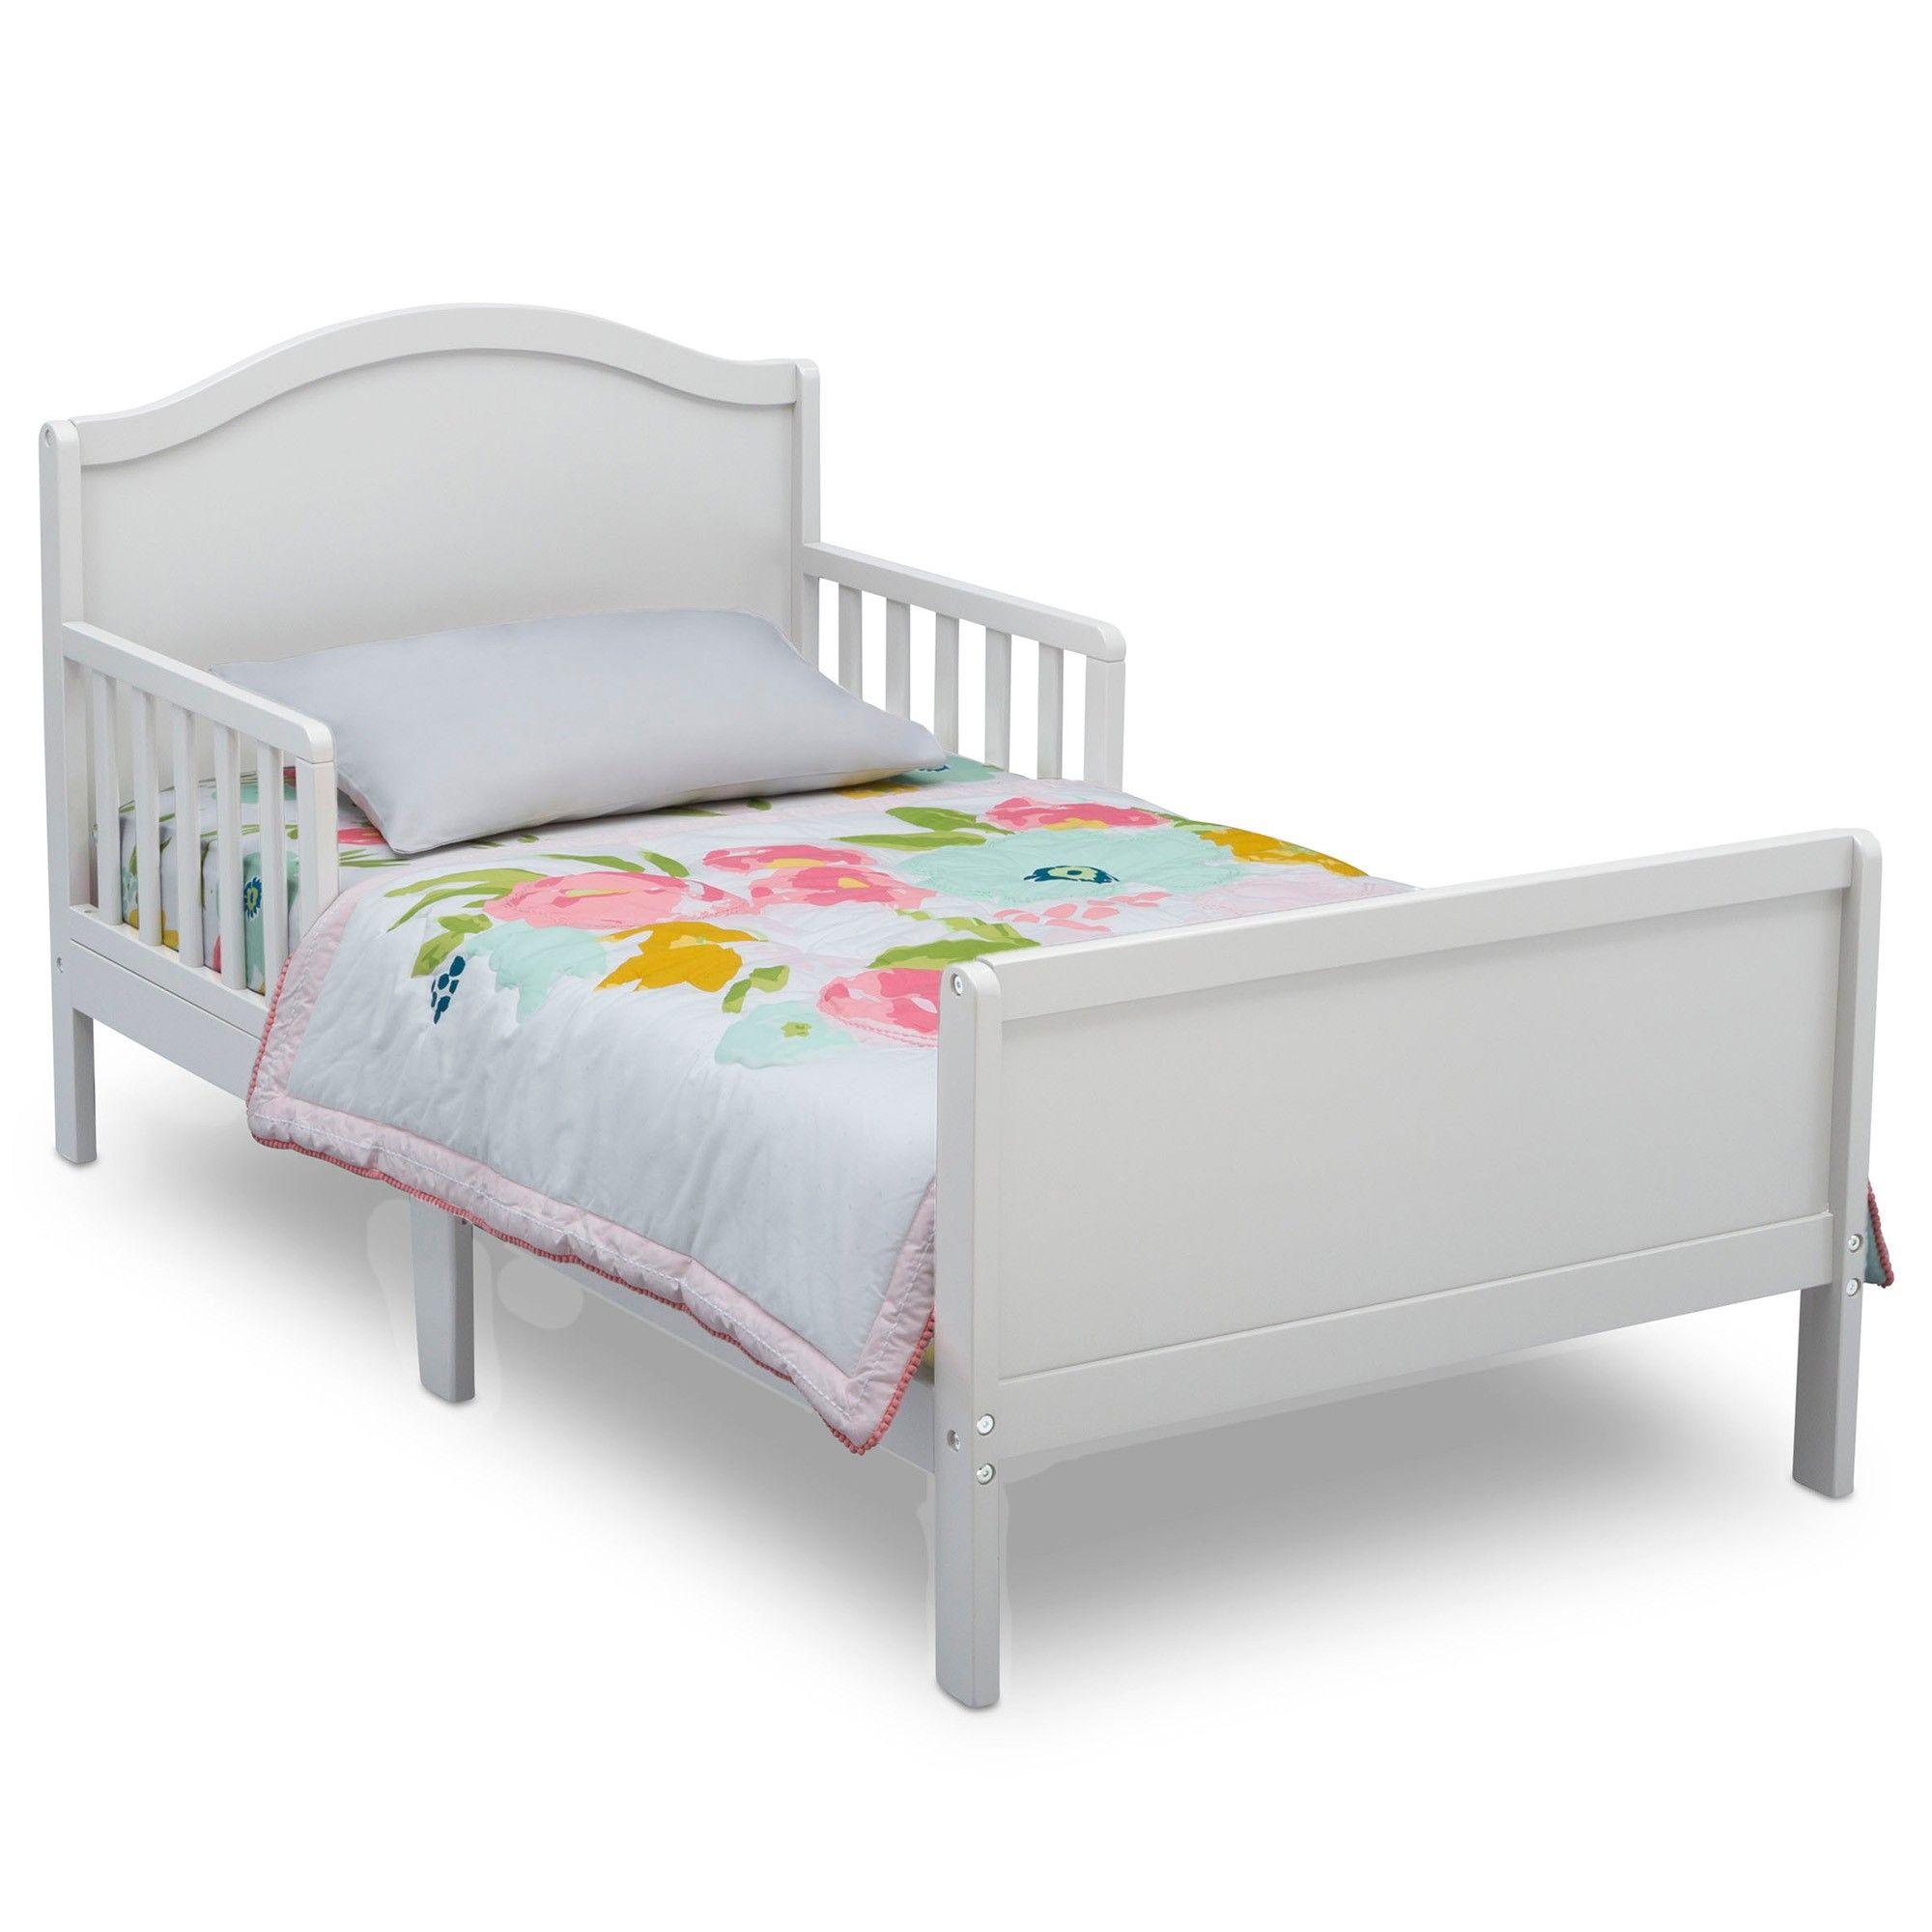 Delta Children Bennett Toddler Bed Bianca White Bed Toddler